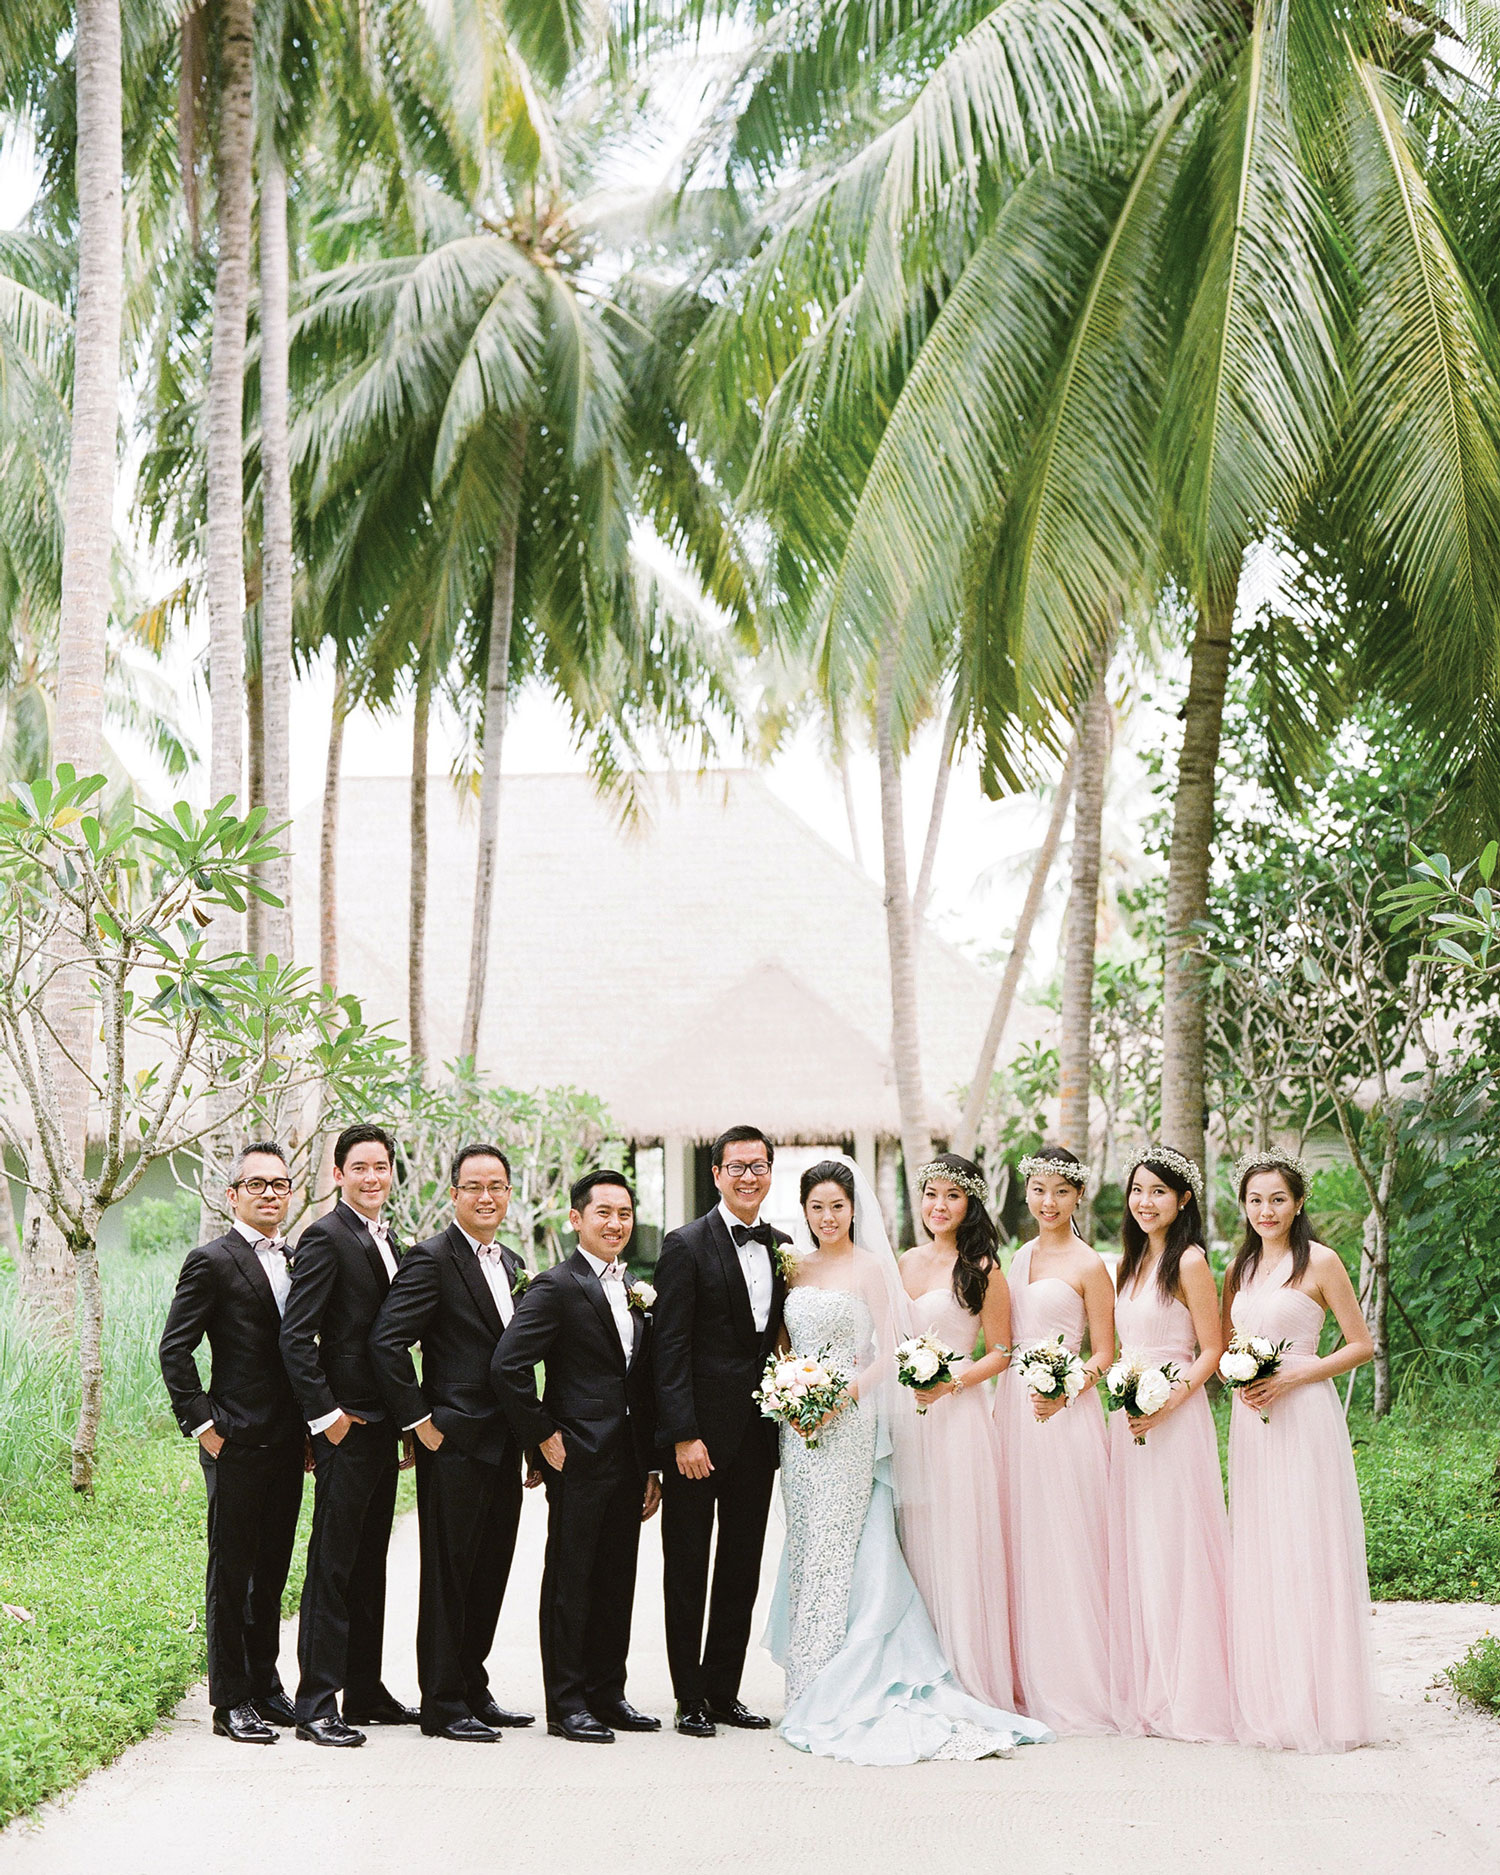 peony-richard-wedding-maldives-bridal-party-palm-trees-1258-s112383.jpg